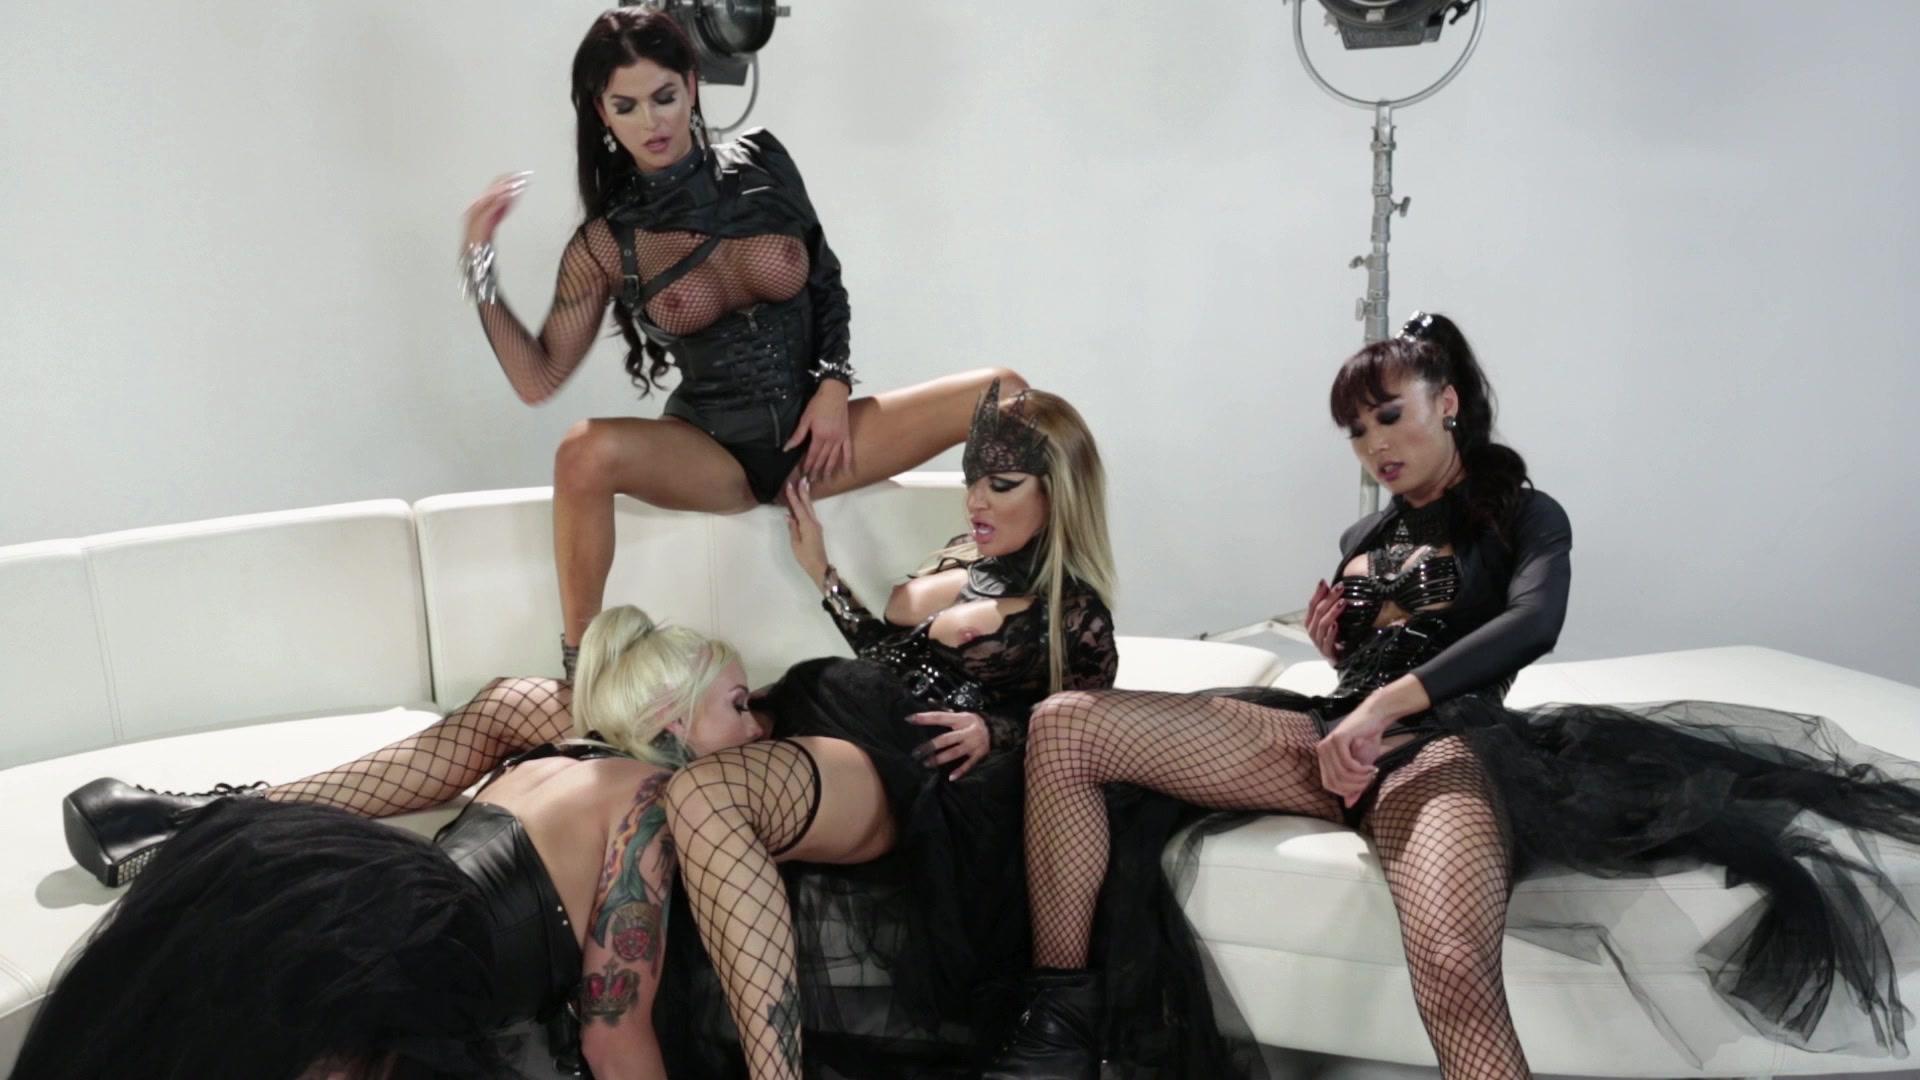 hot sexy naked women ready to fuck